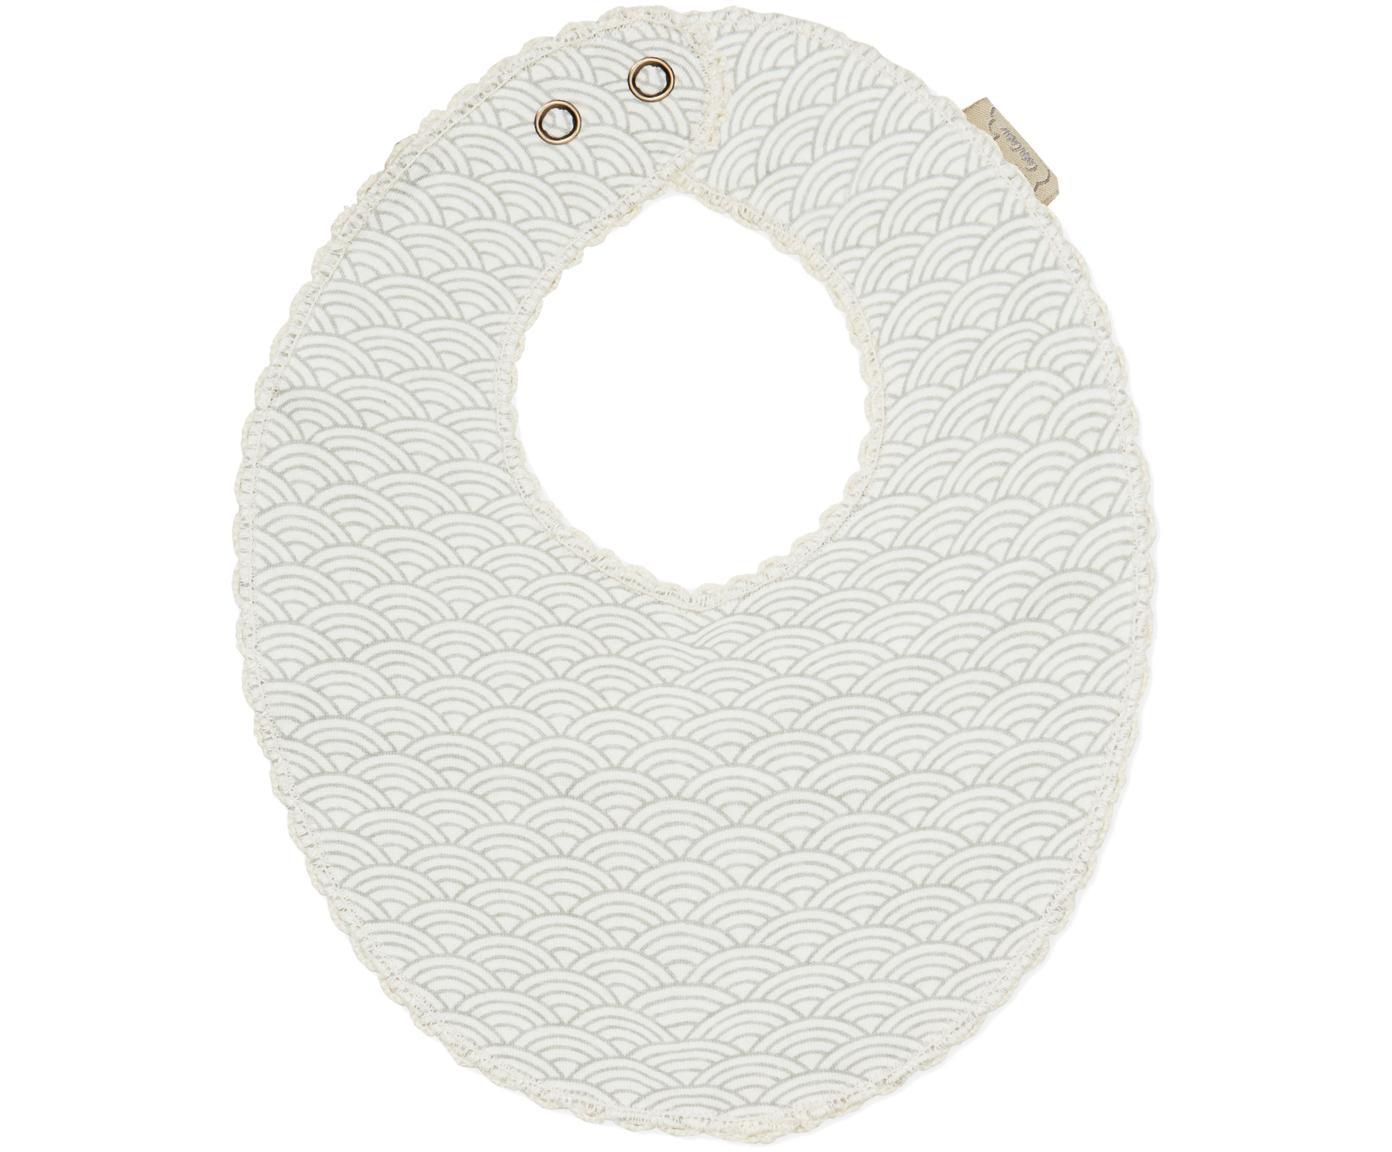 Slabbetje Protect, Organisch katoen, Grijs, wit, 20 x 23 cm